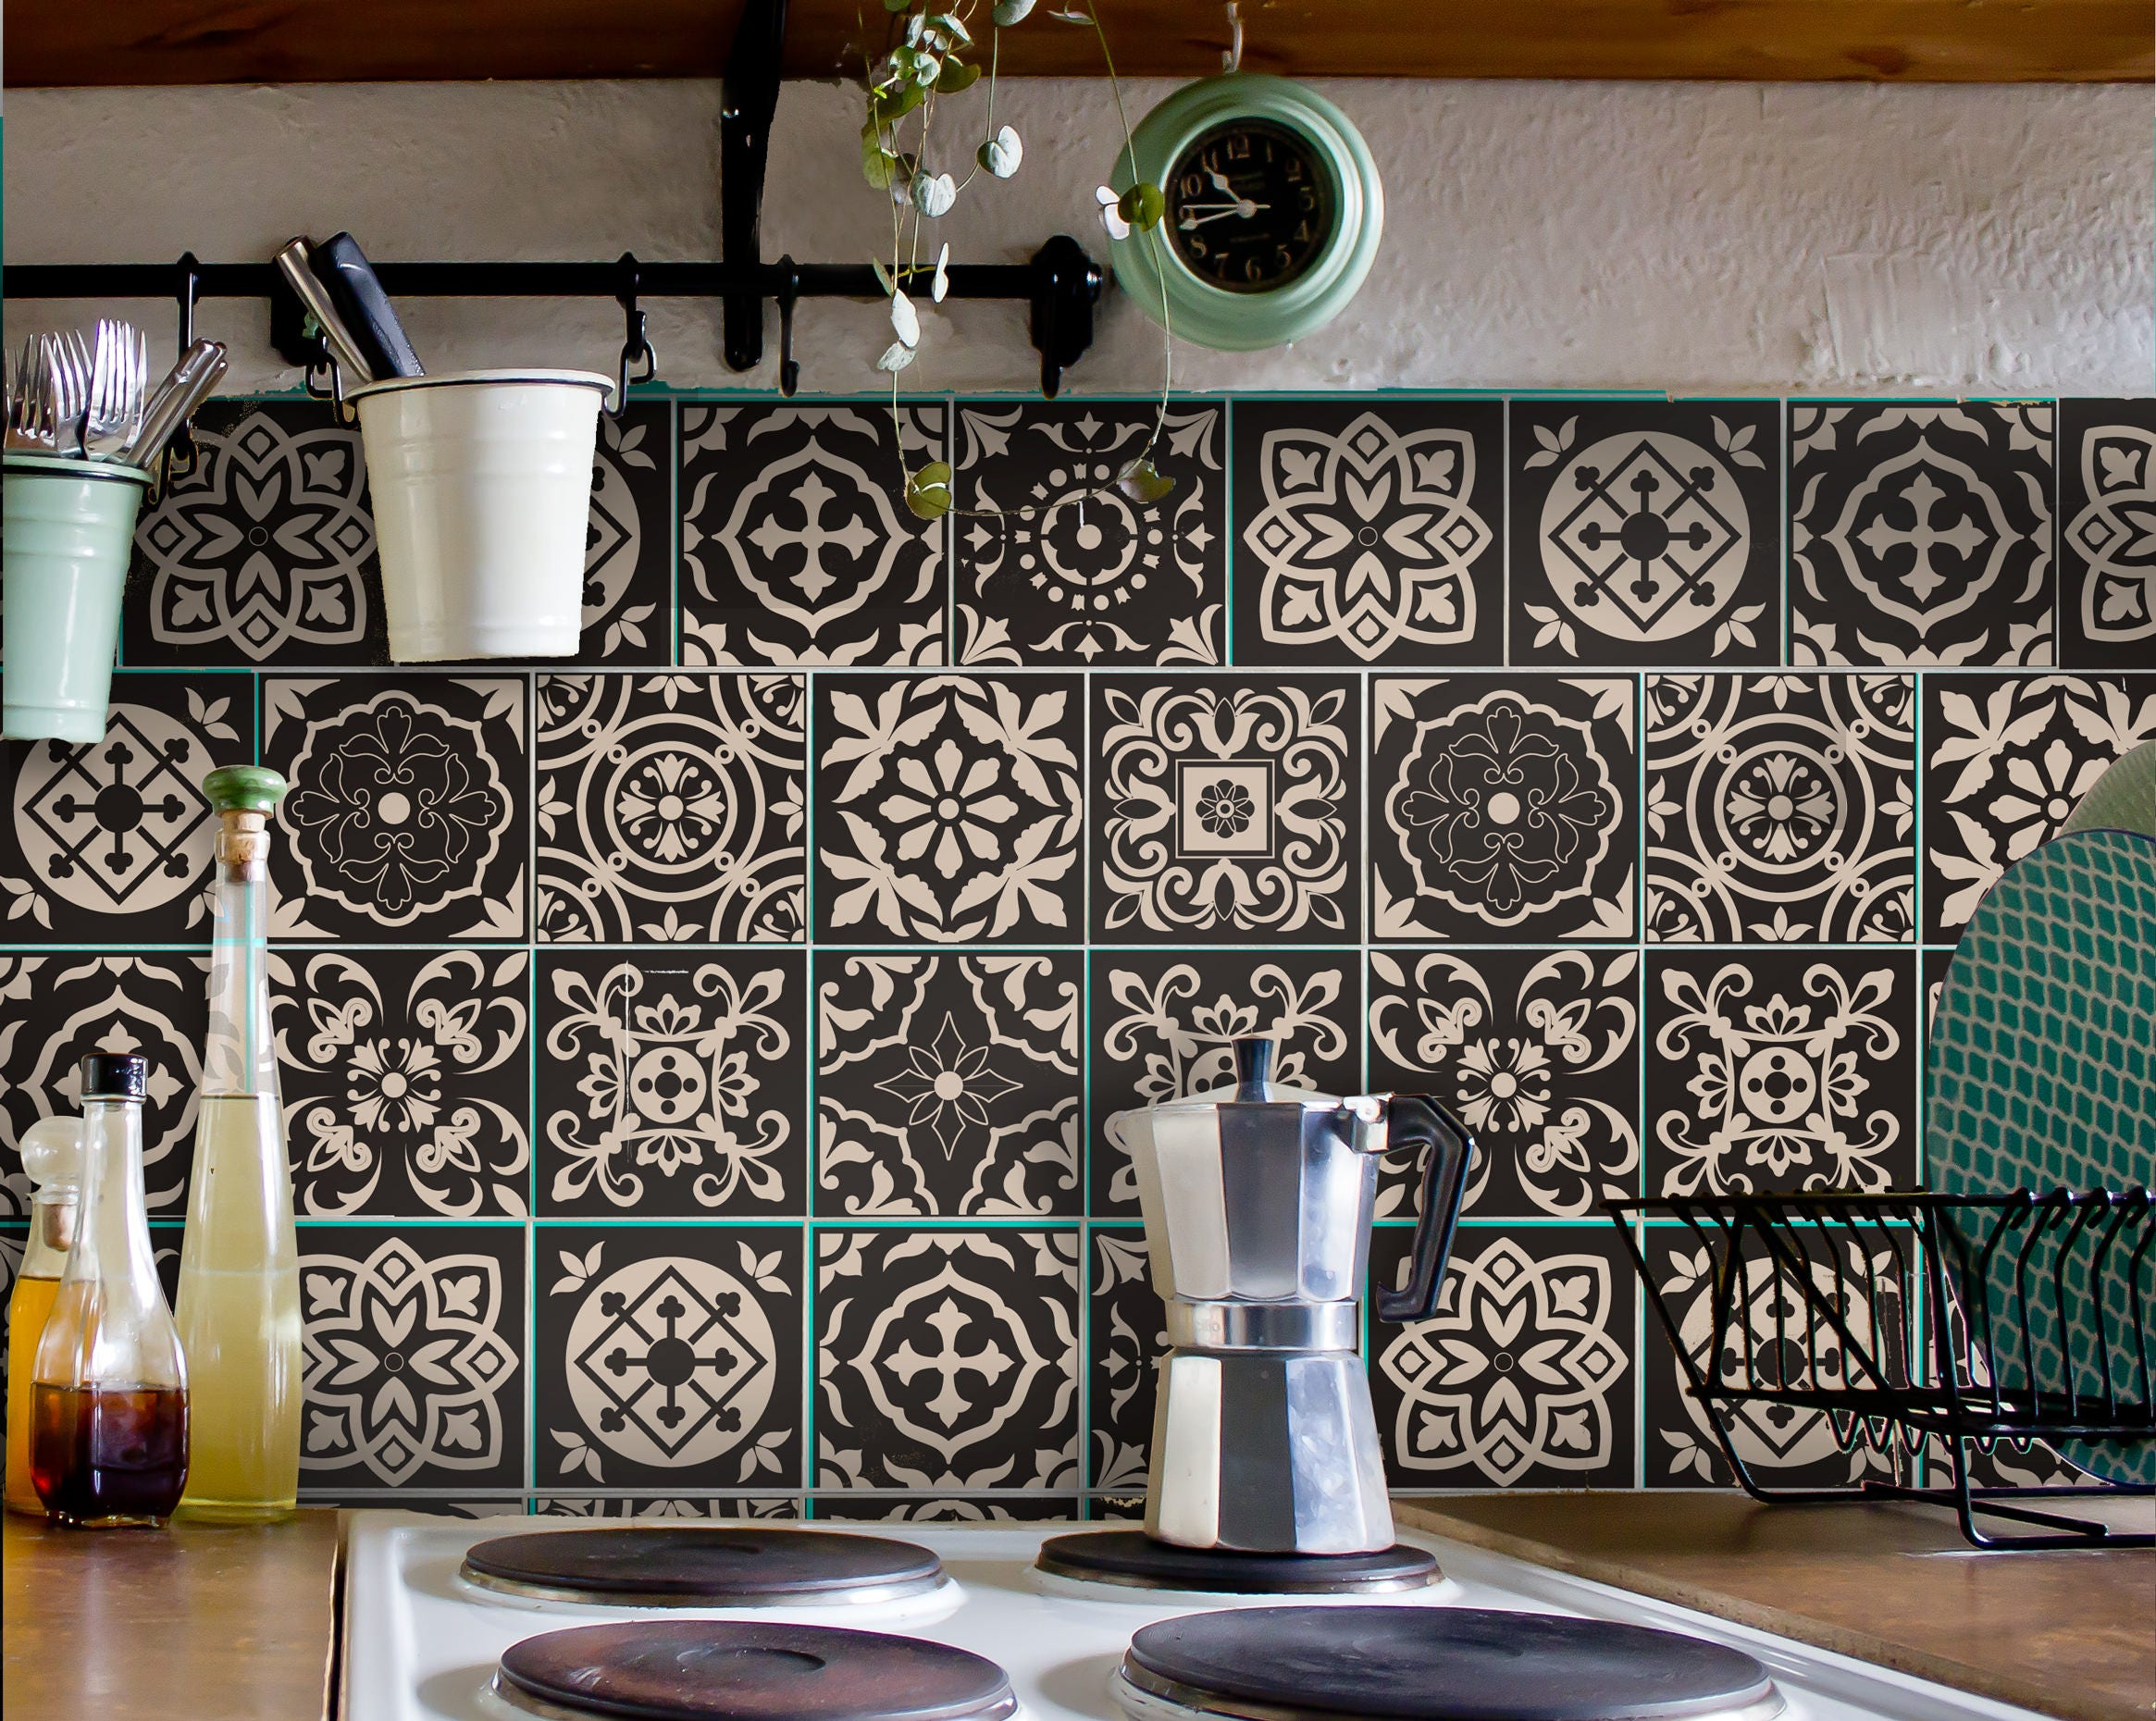 tile decals carrelage stickers kitchen bathroom portuguese zoom